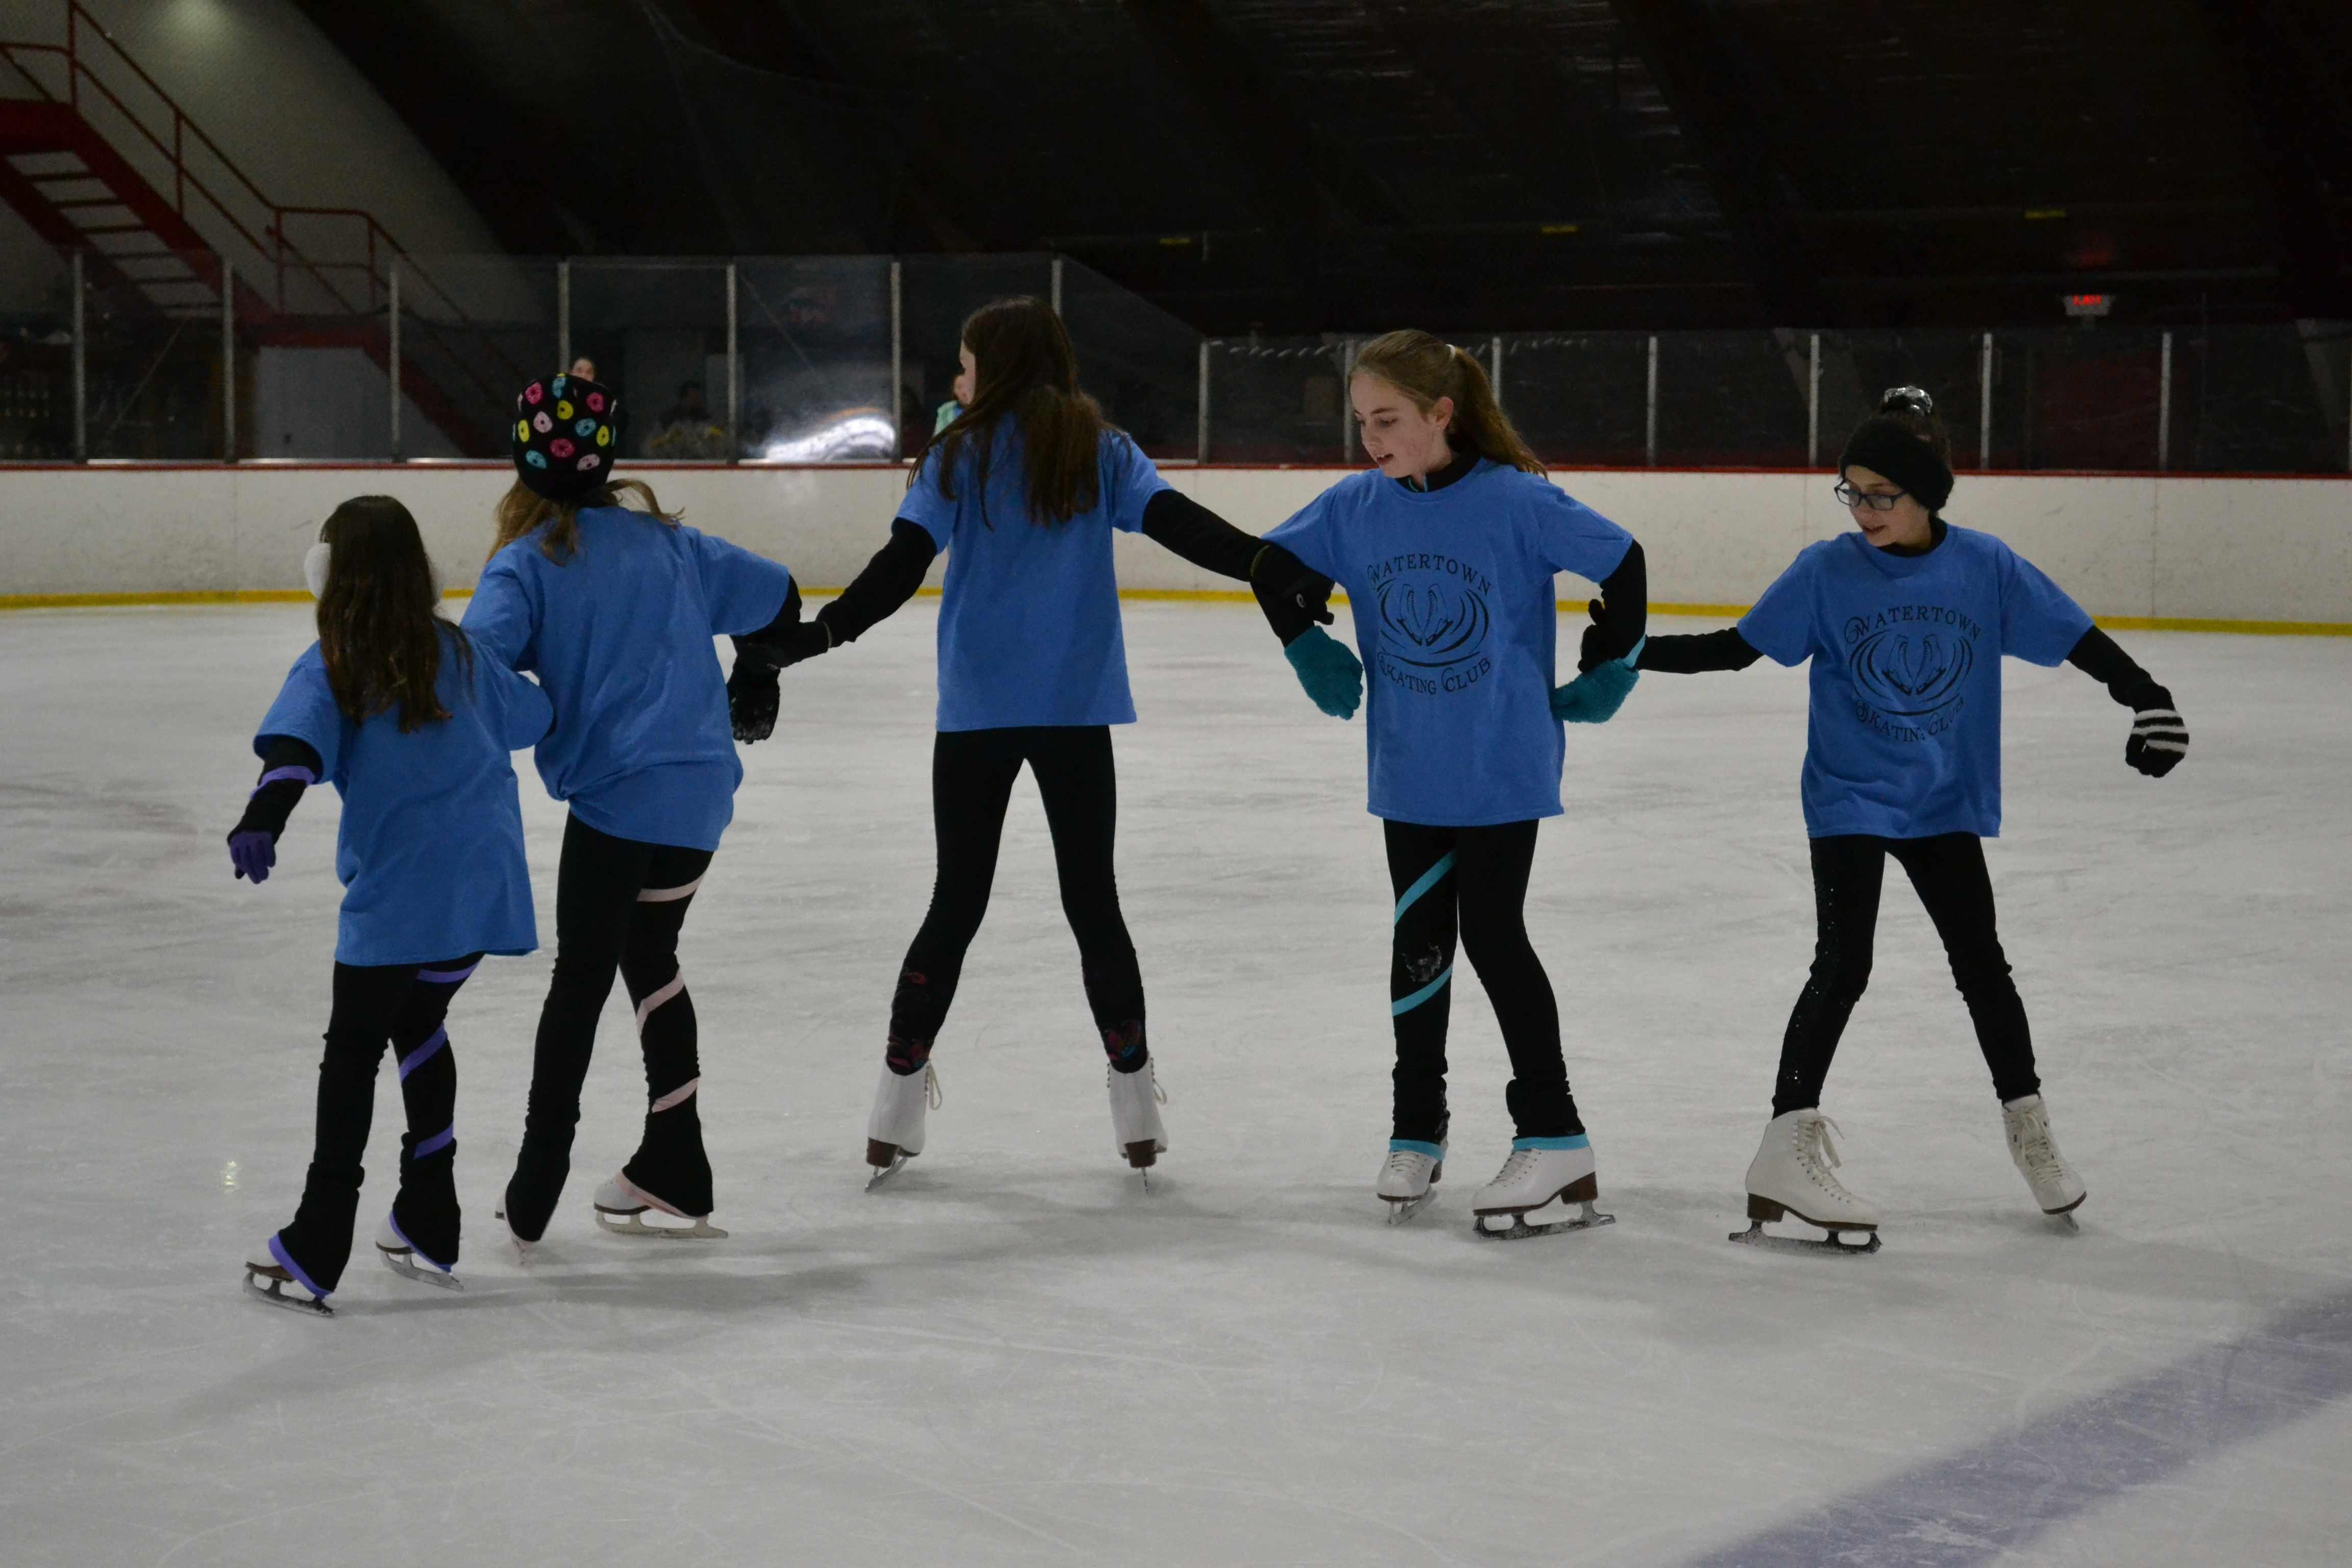 Roller skating rink waterbury ct - 2017 End Of Year Show